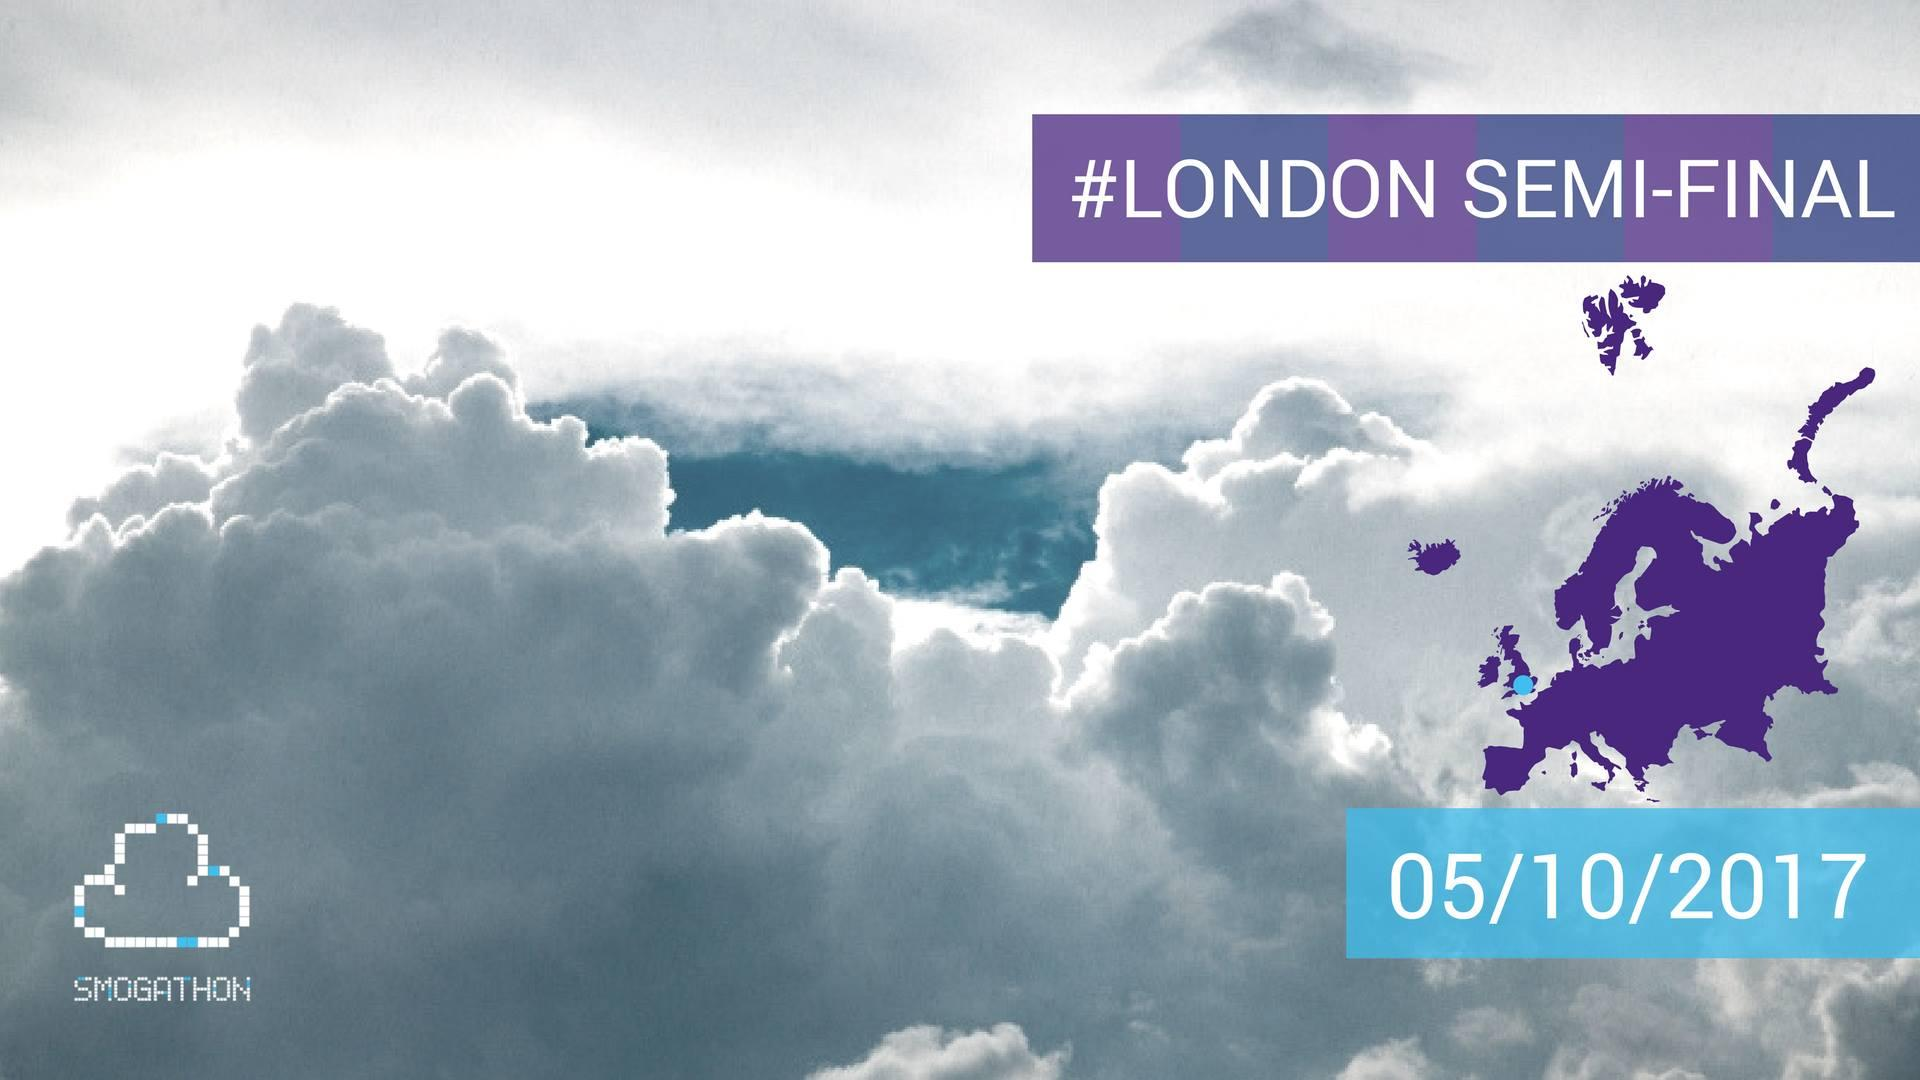 London Semi-final: Smogathon 2017 Global Edition